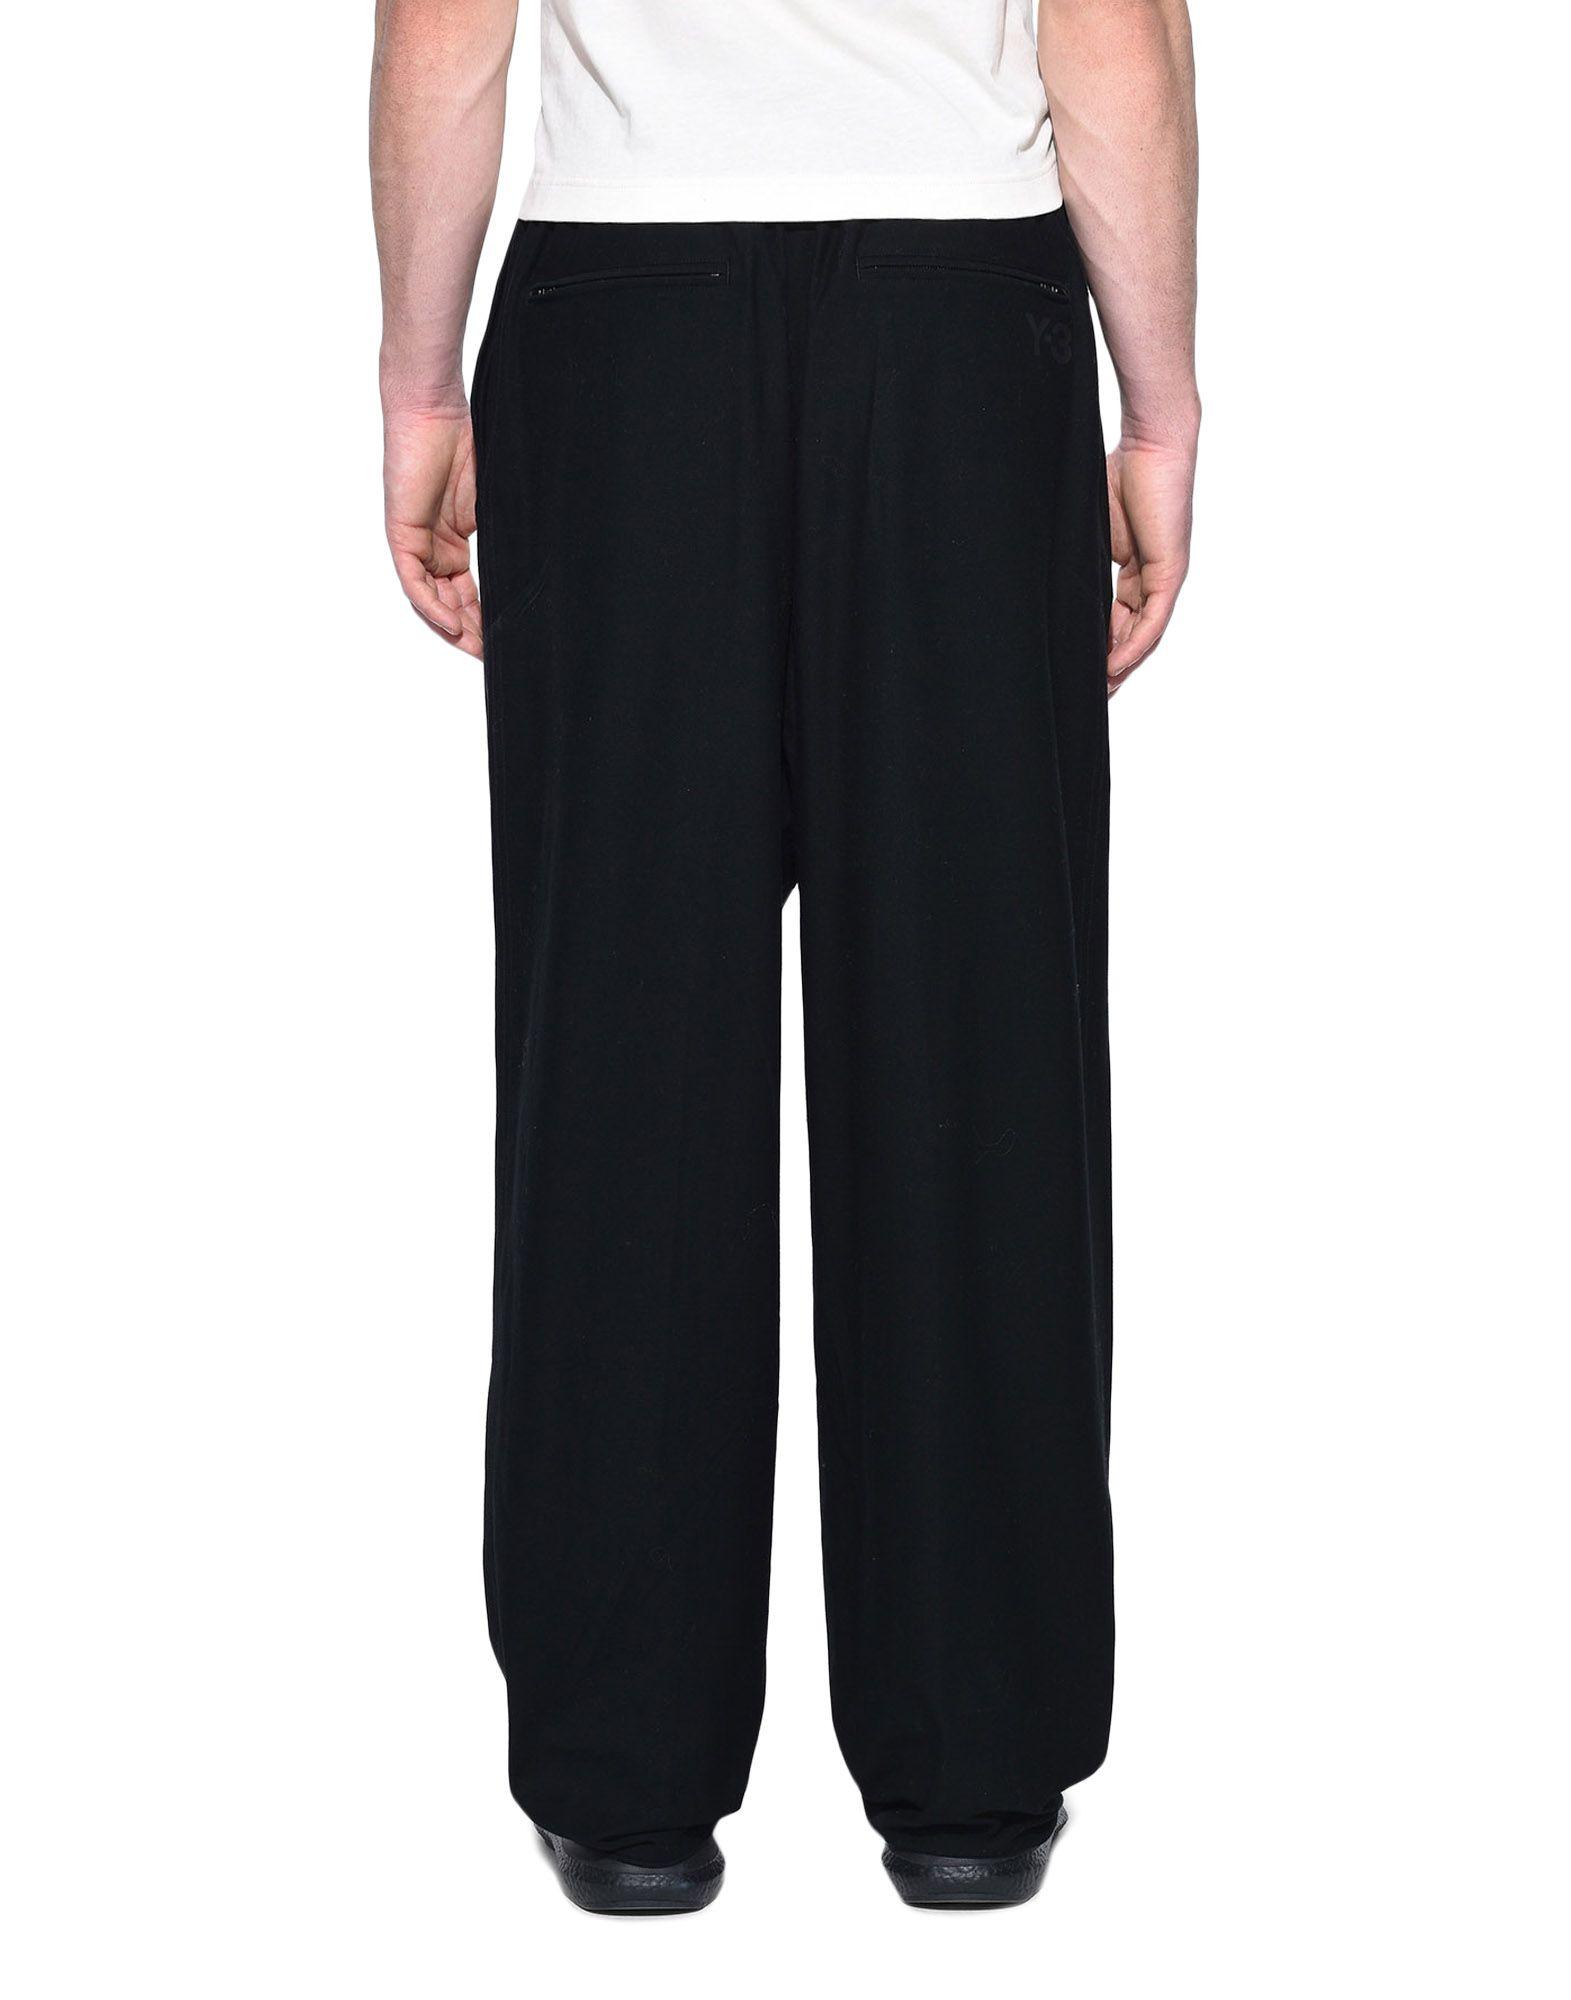 Y-3 Y-3 Twill Wide Pants Casual pants Man d